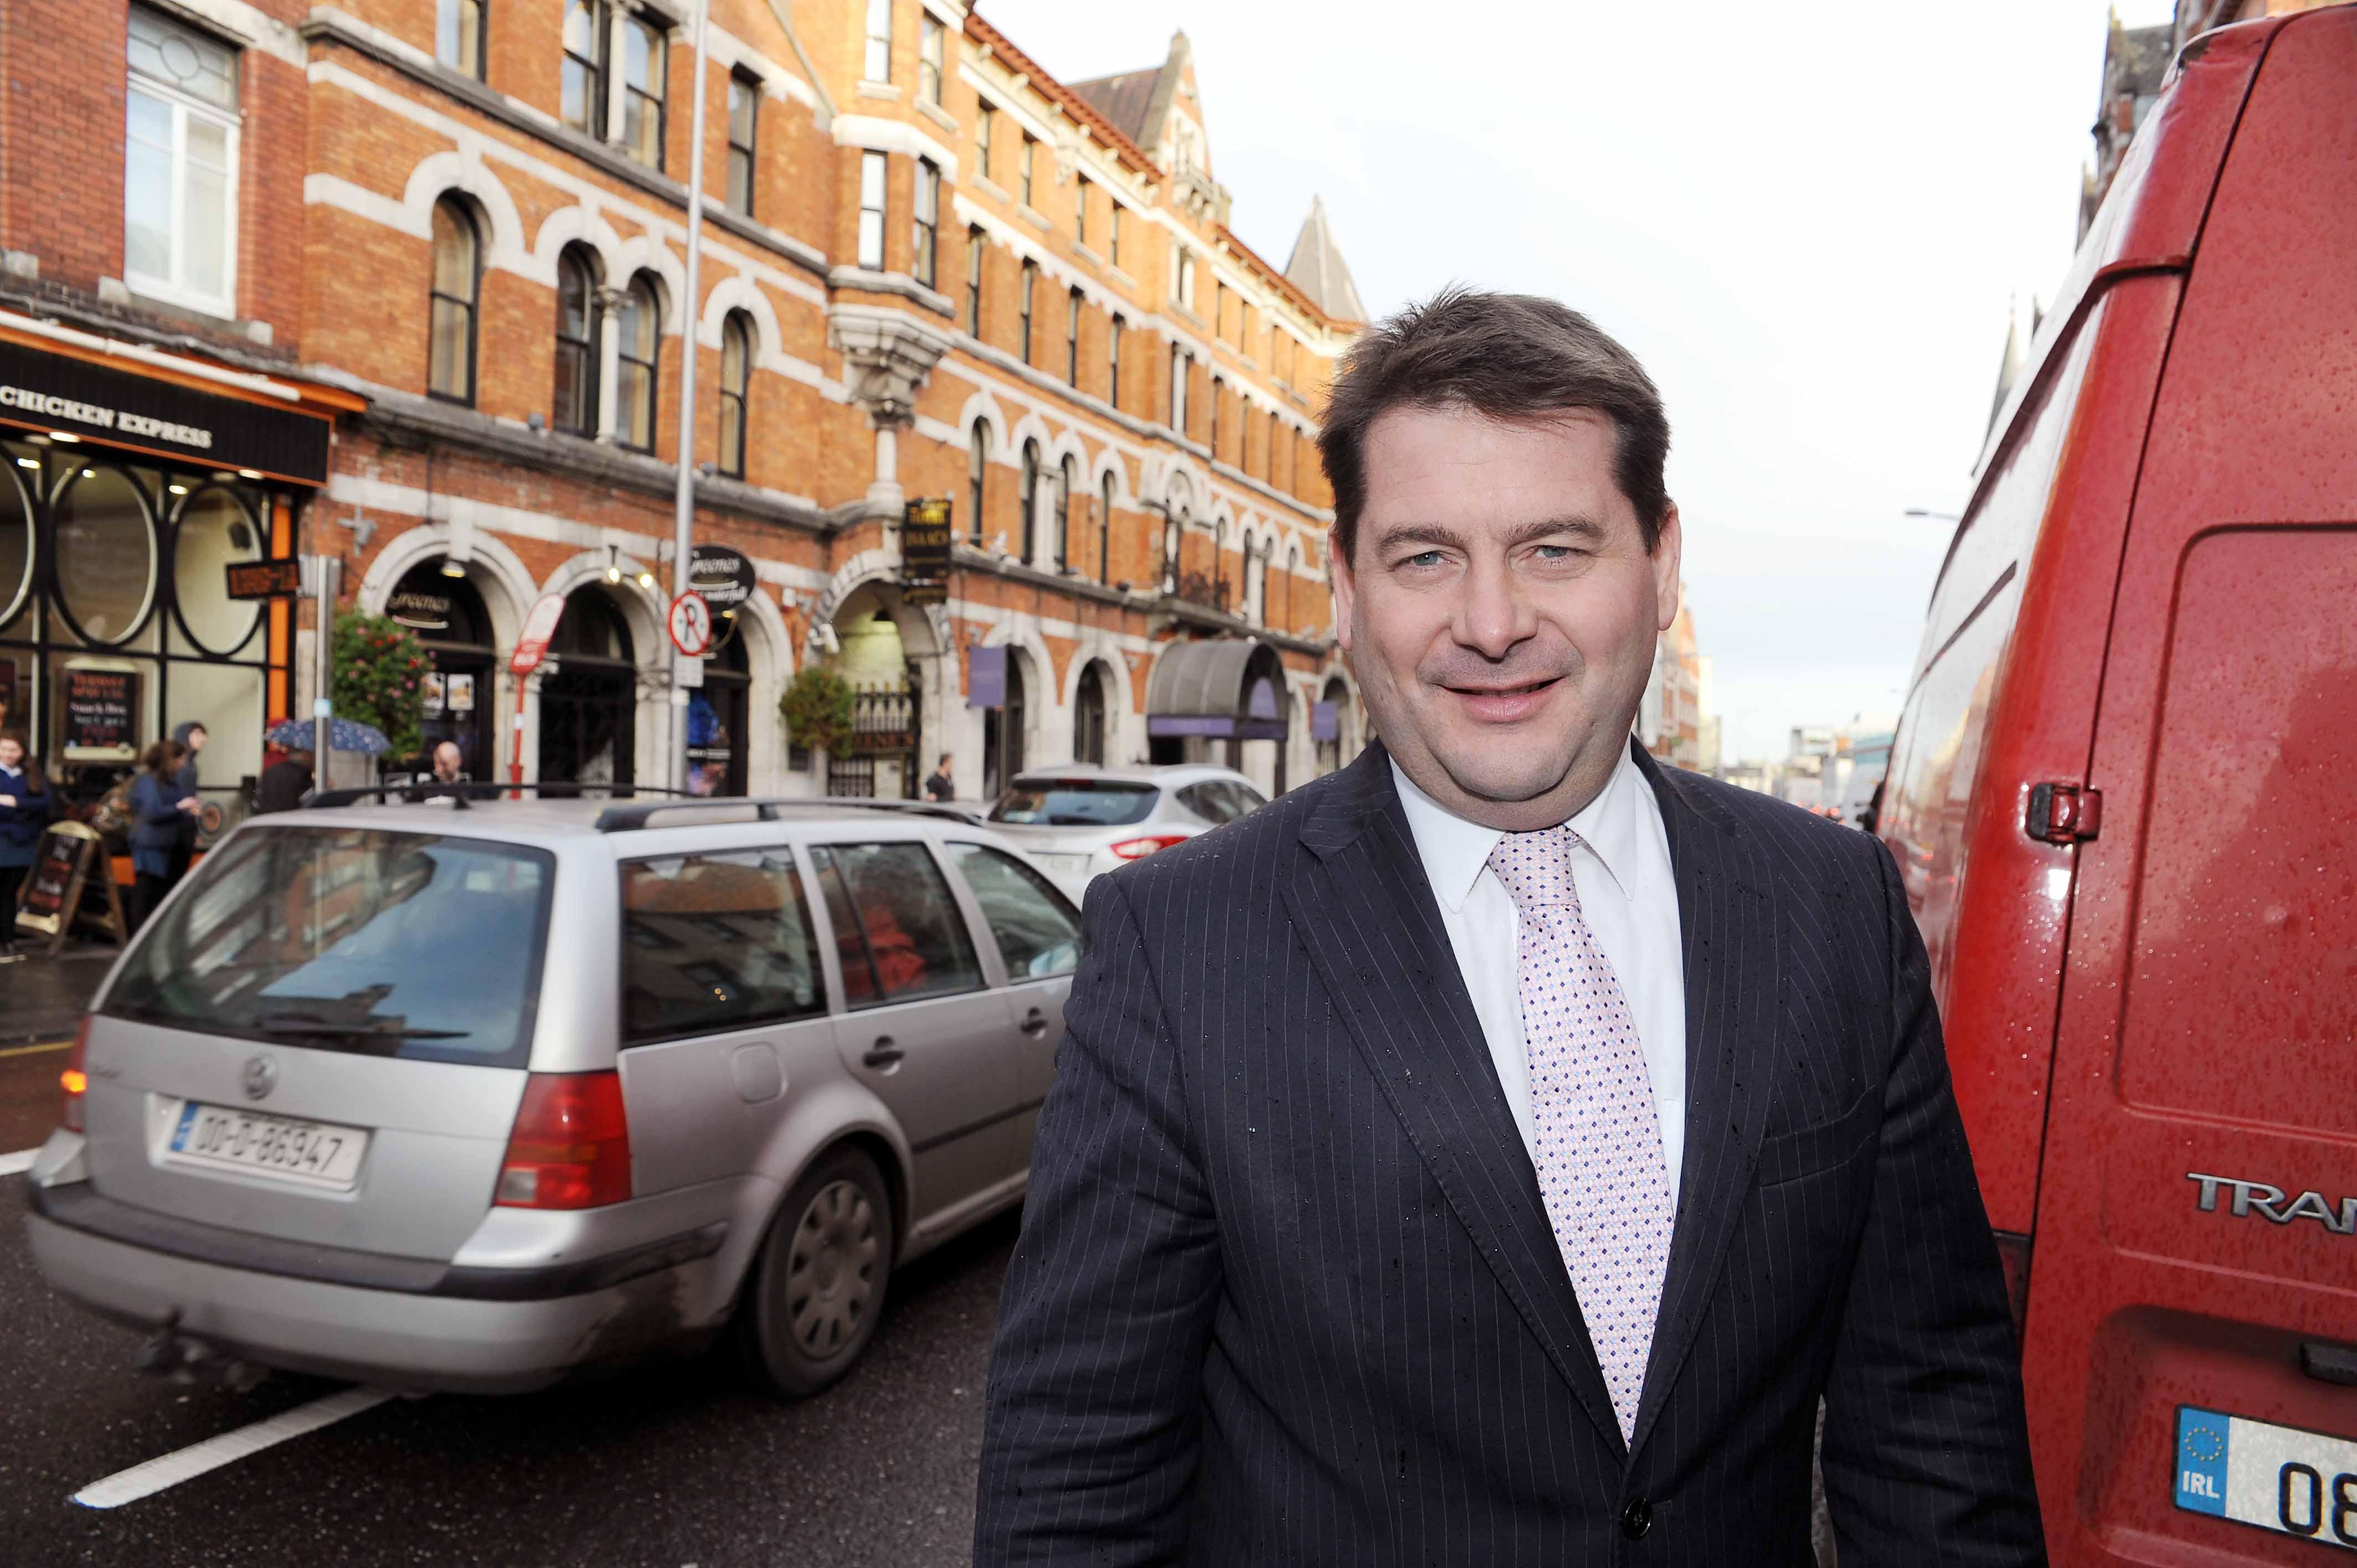 CORK POLITICS: Dara Murphy becomes EPP Campaign Director for 2019 European elections